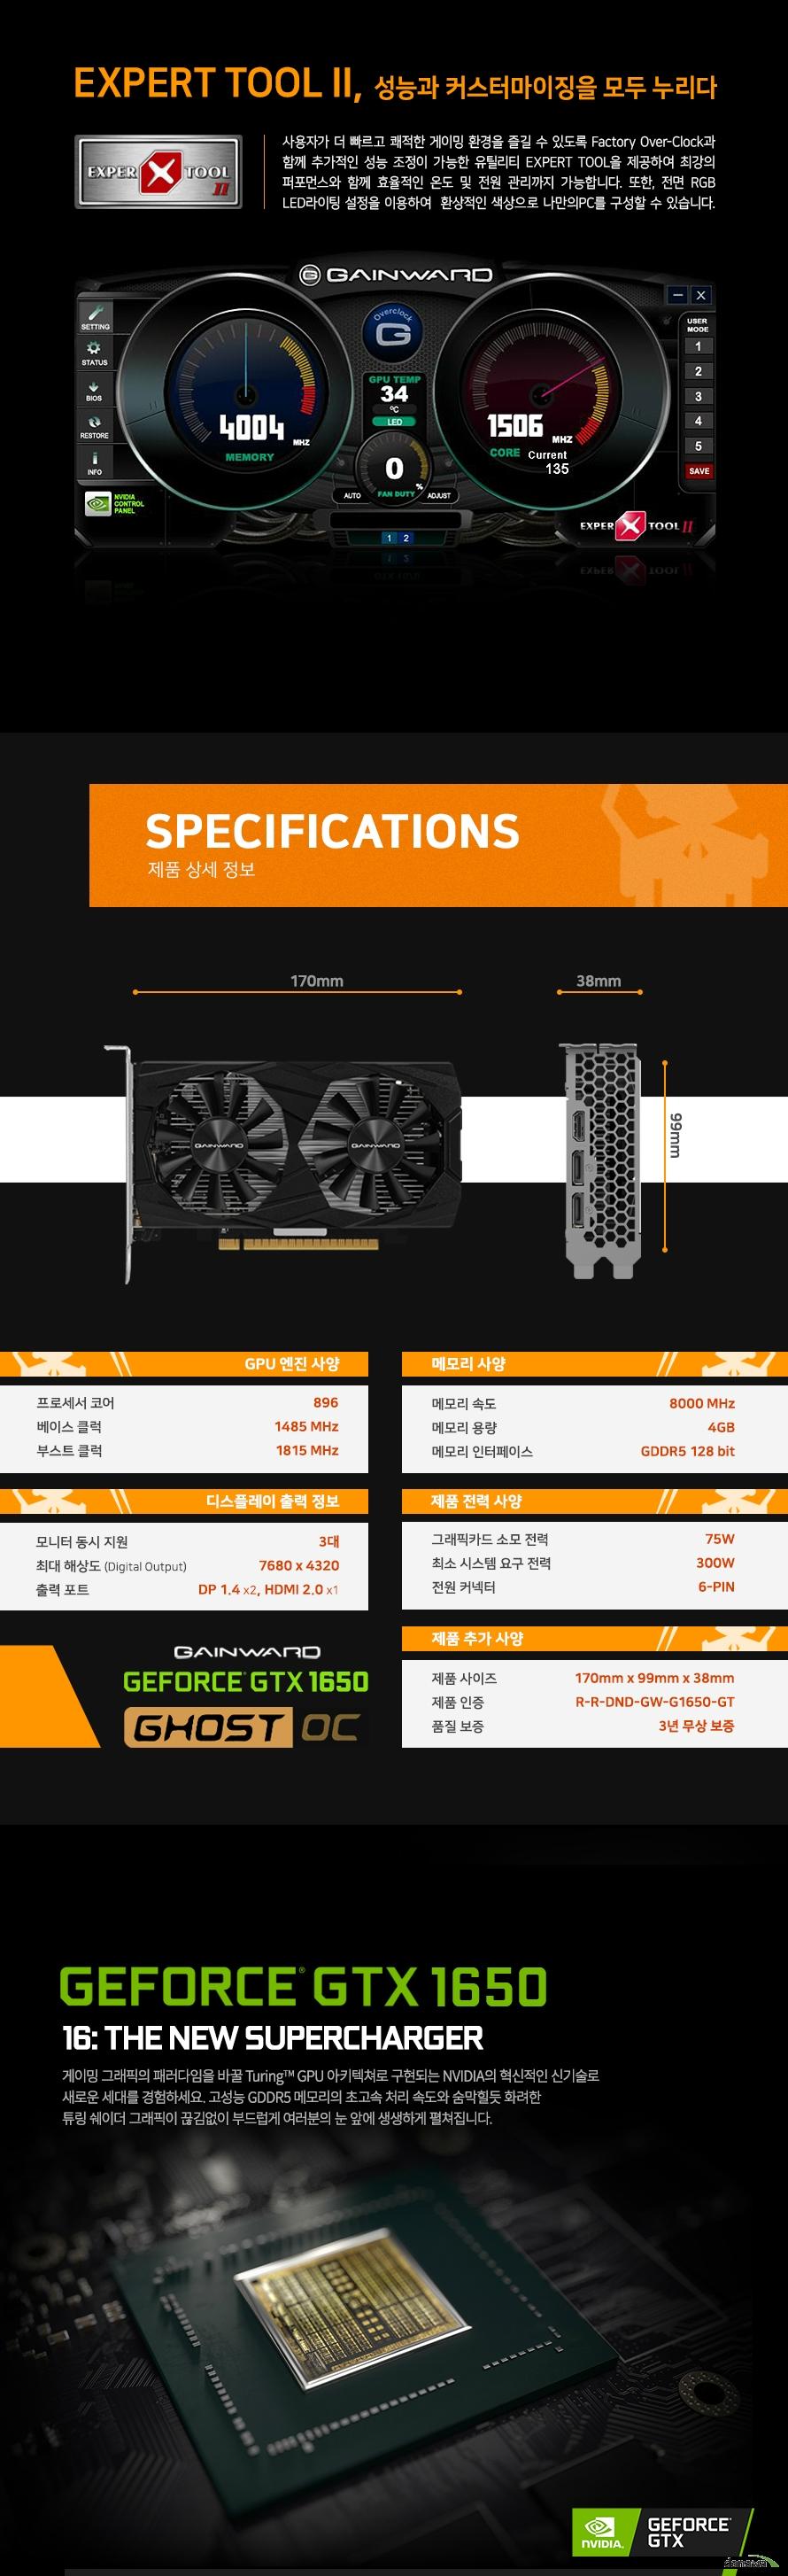 GAINWARD  지포스 GTX 1650 고스트 OC D5 4GB